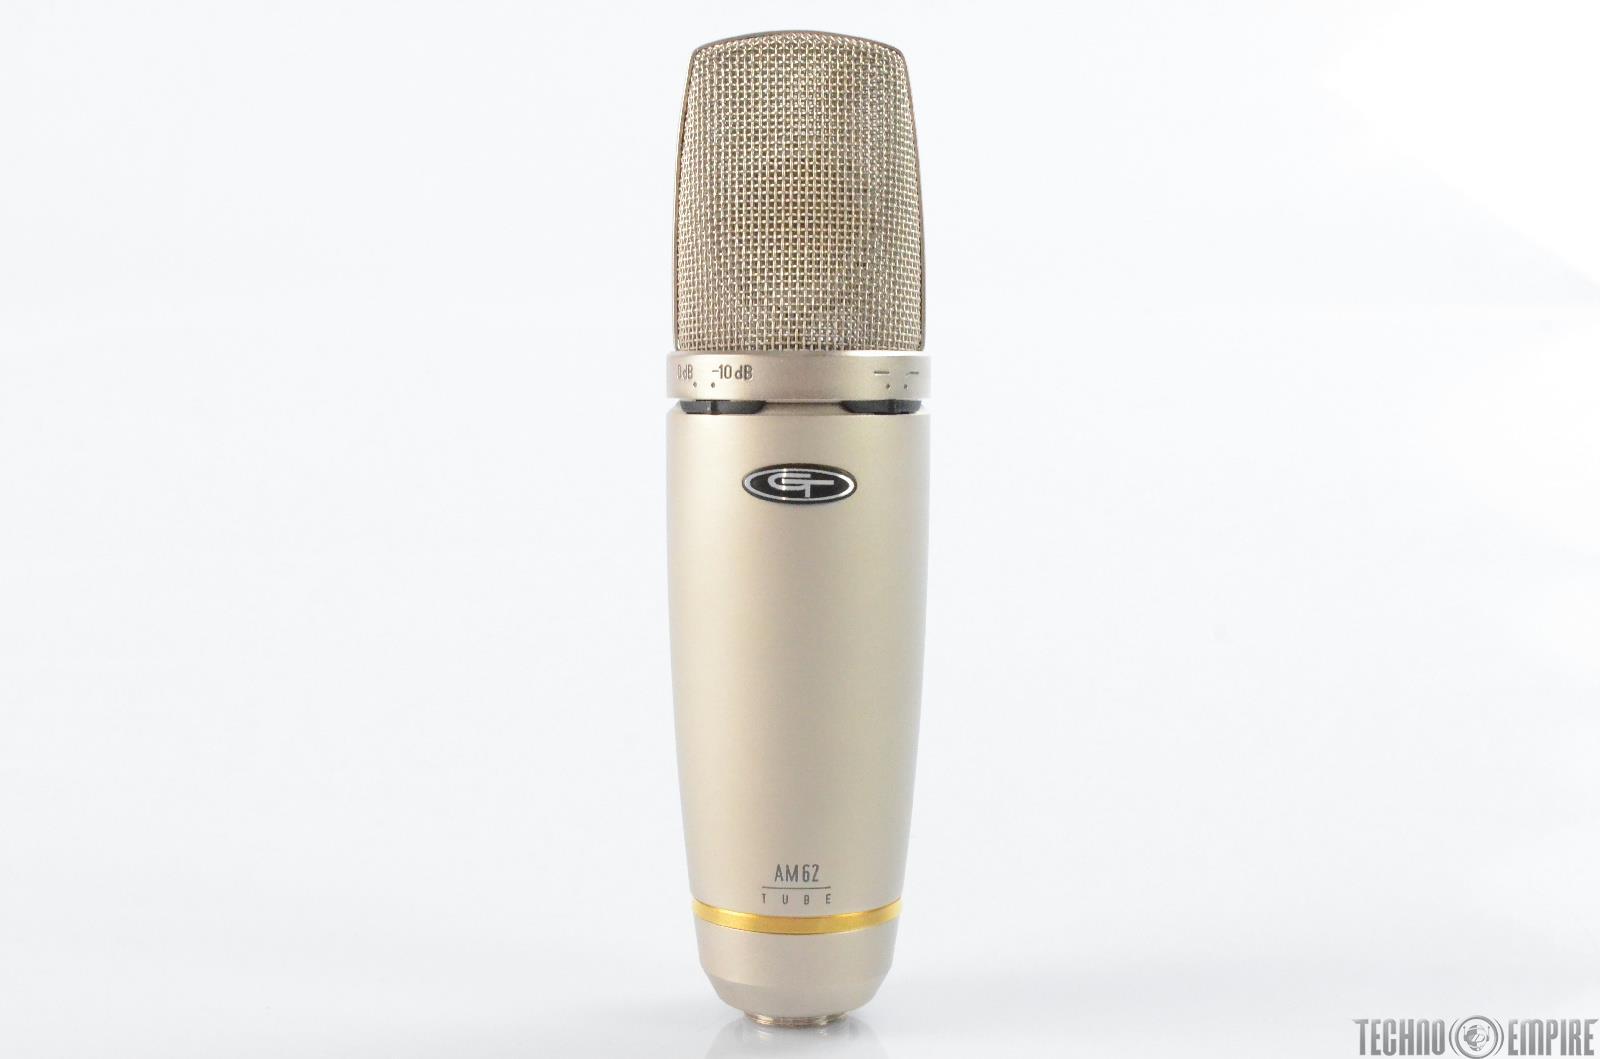 Alesis Groove Tubes GT AM62 Tube Condenser Microphone Studio Mic #28944